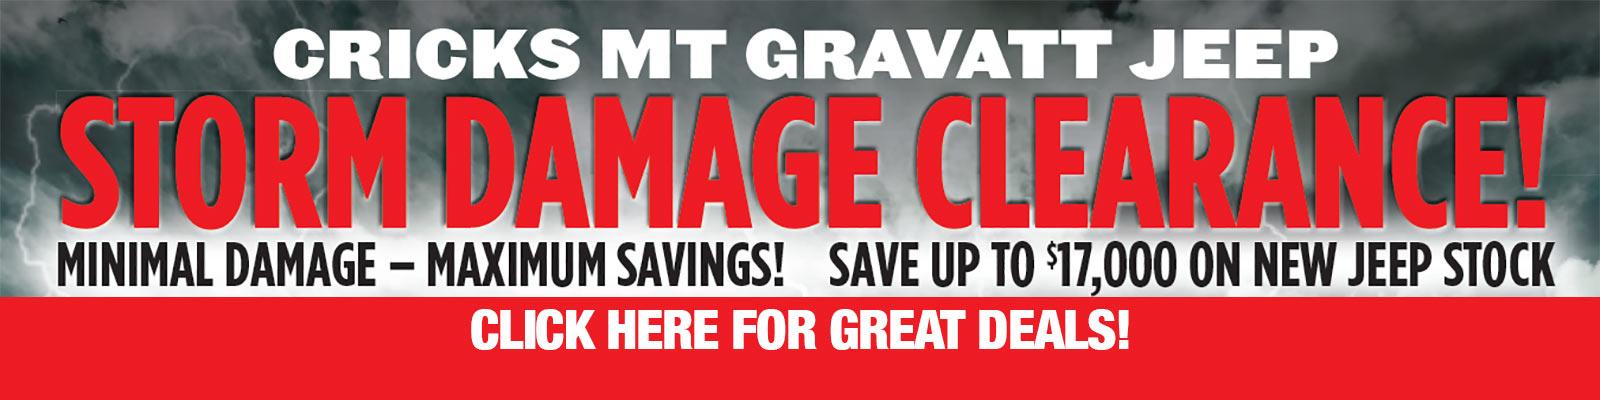 Storm damage clearance on now at Cricks Mt Gravatt